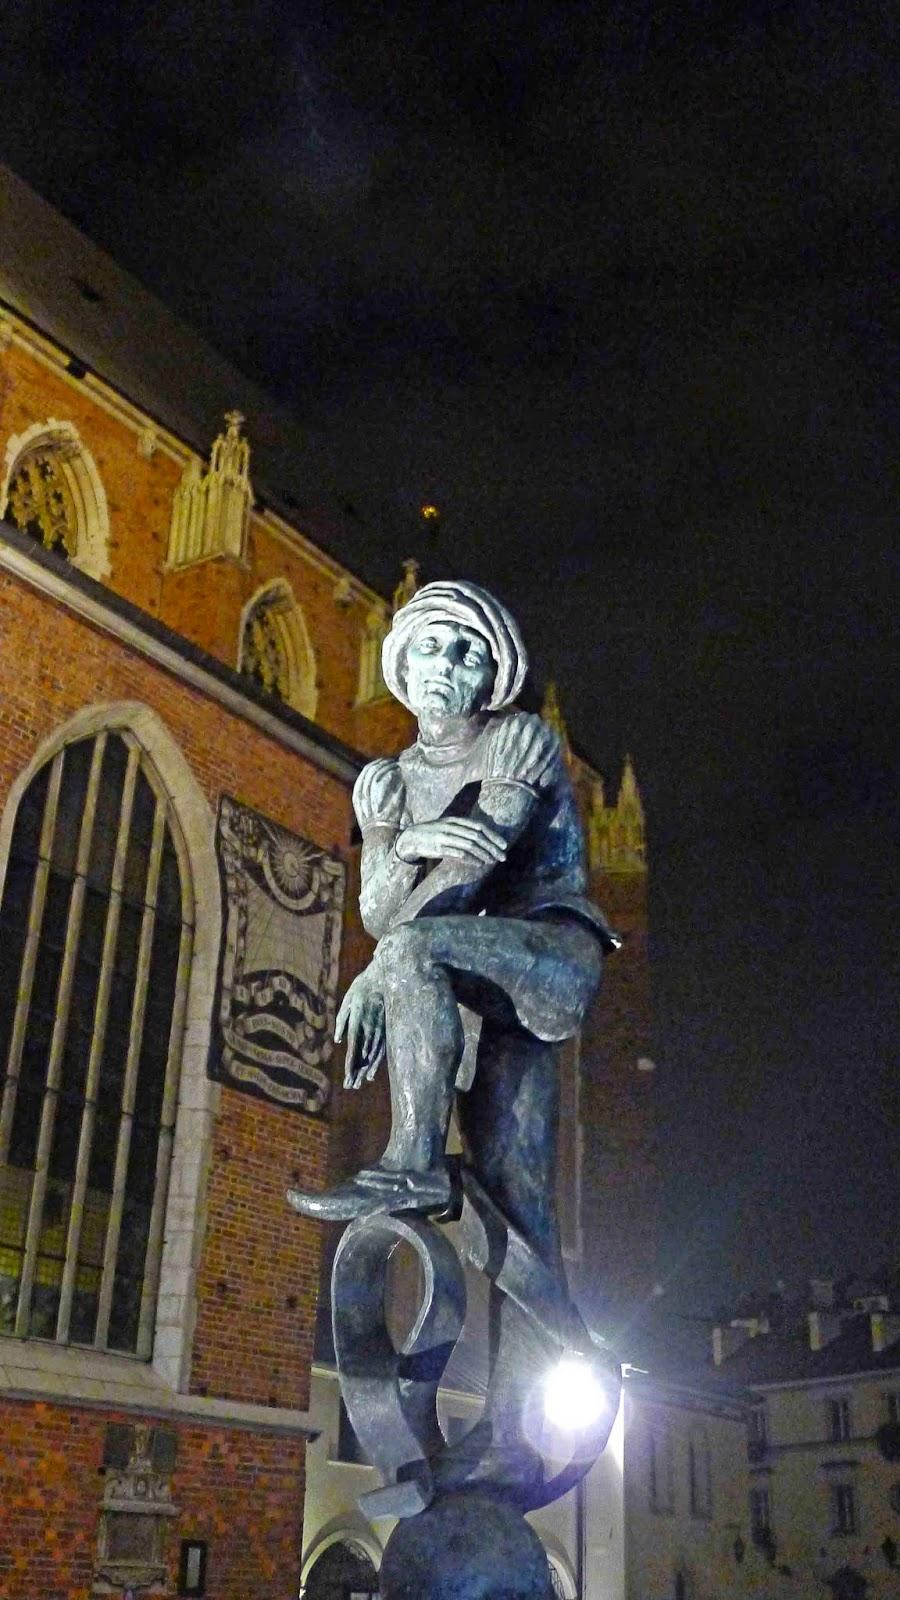 Statue Outside St. Mary's Basilica